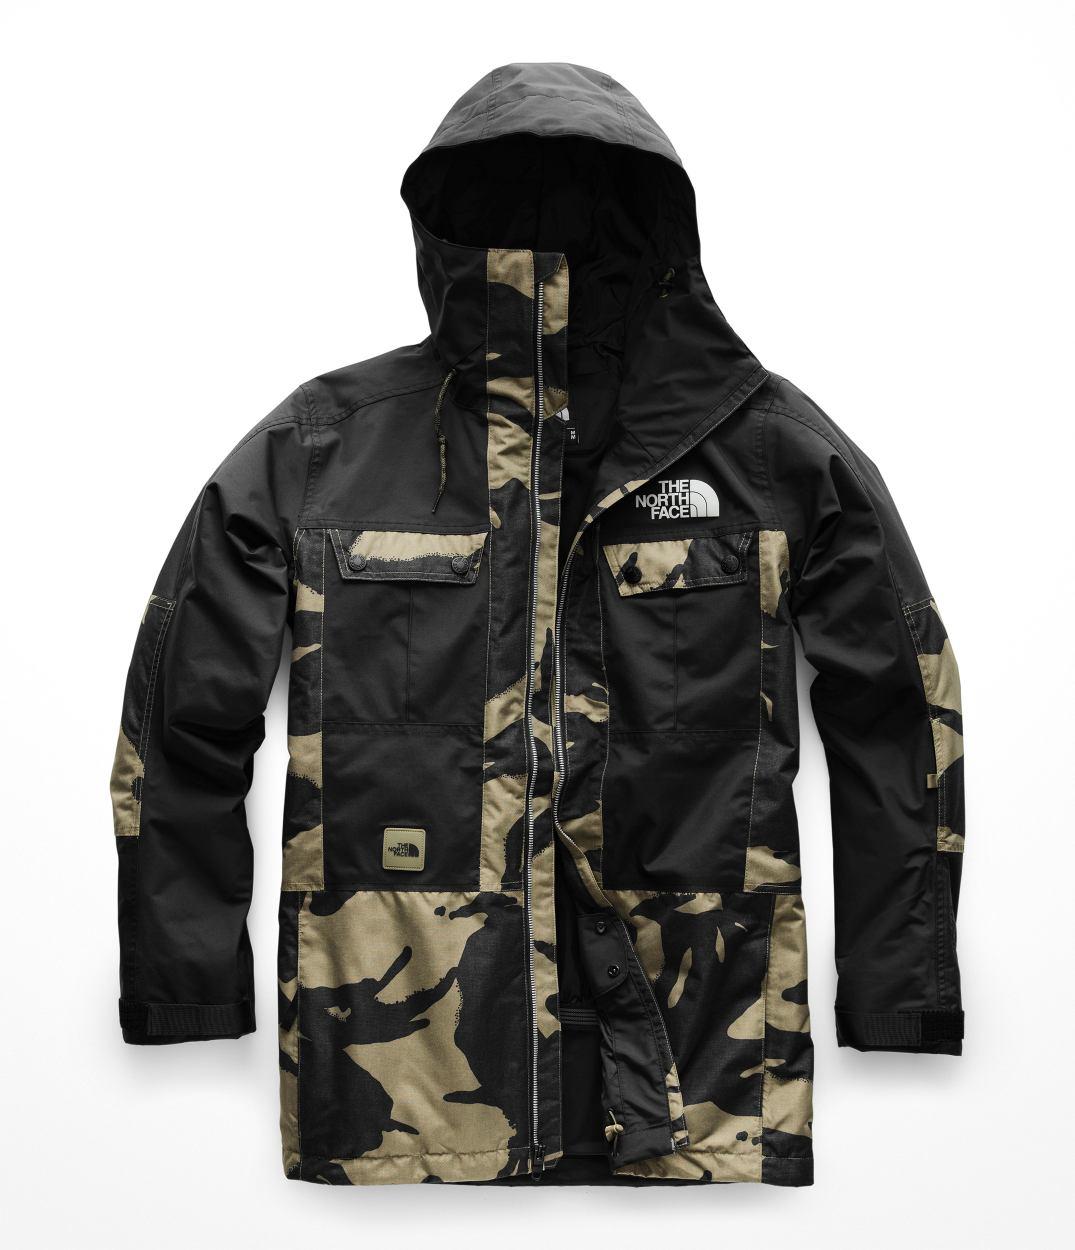 The North Face-Balfron Jacket - Men's